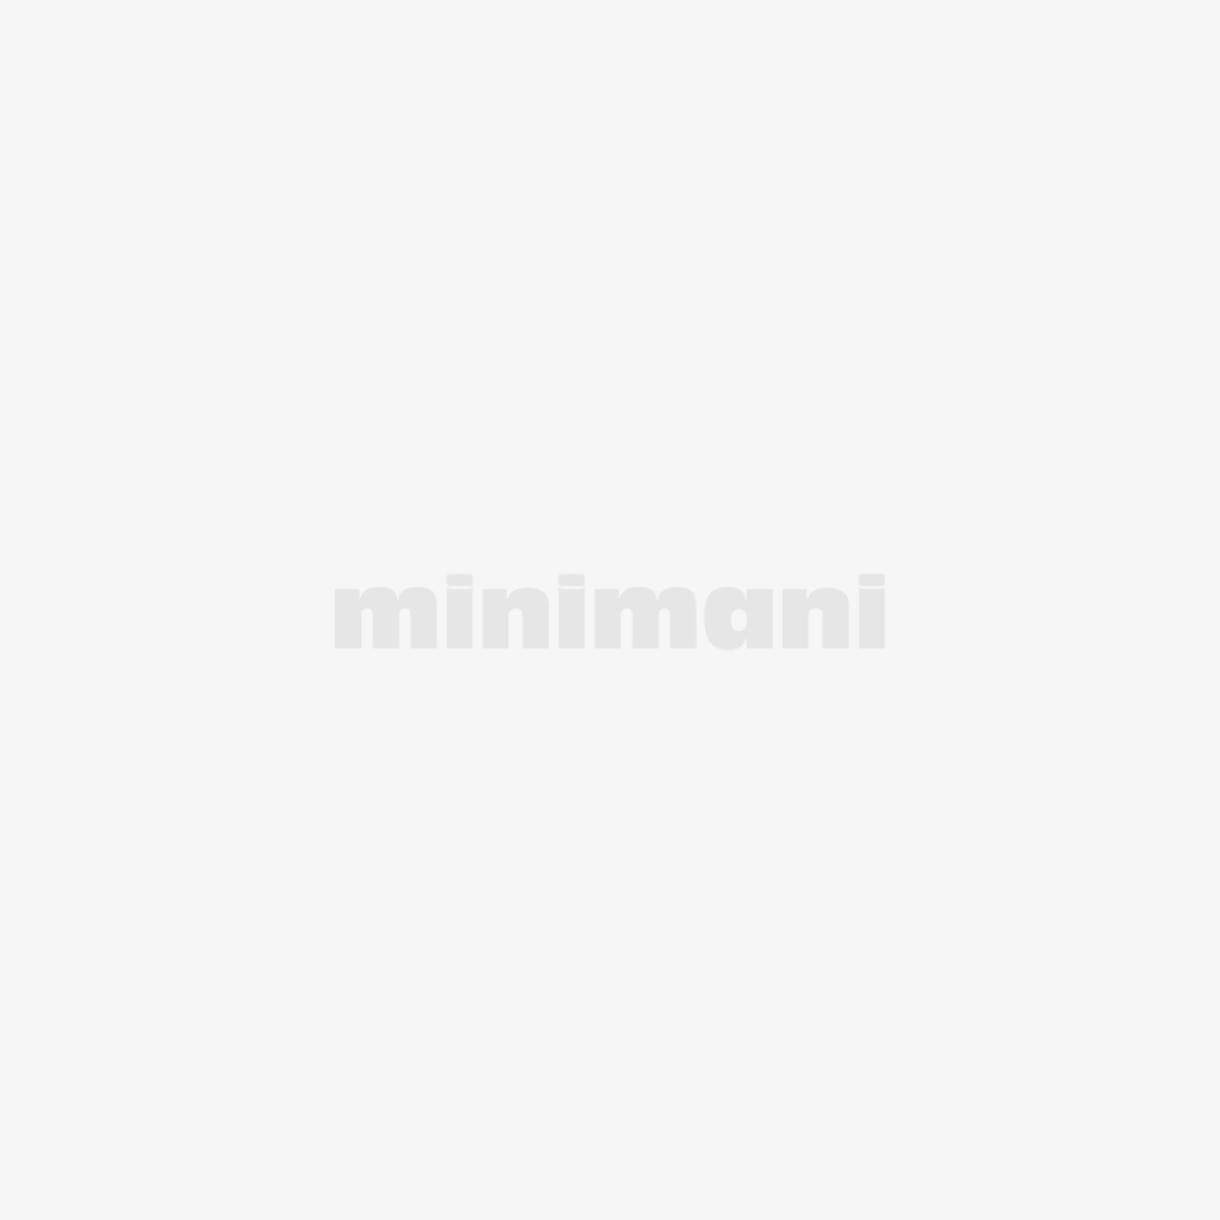 QUIXX QUIXX ACRYLIC SCRATCH REMOVER 50ML 50 ML